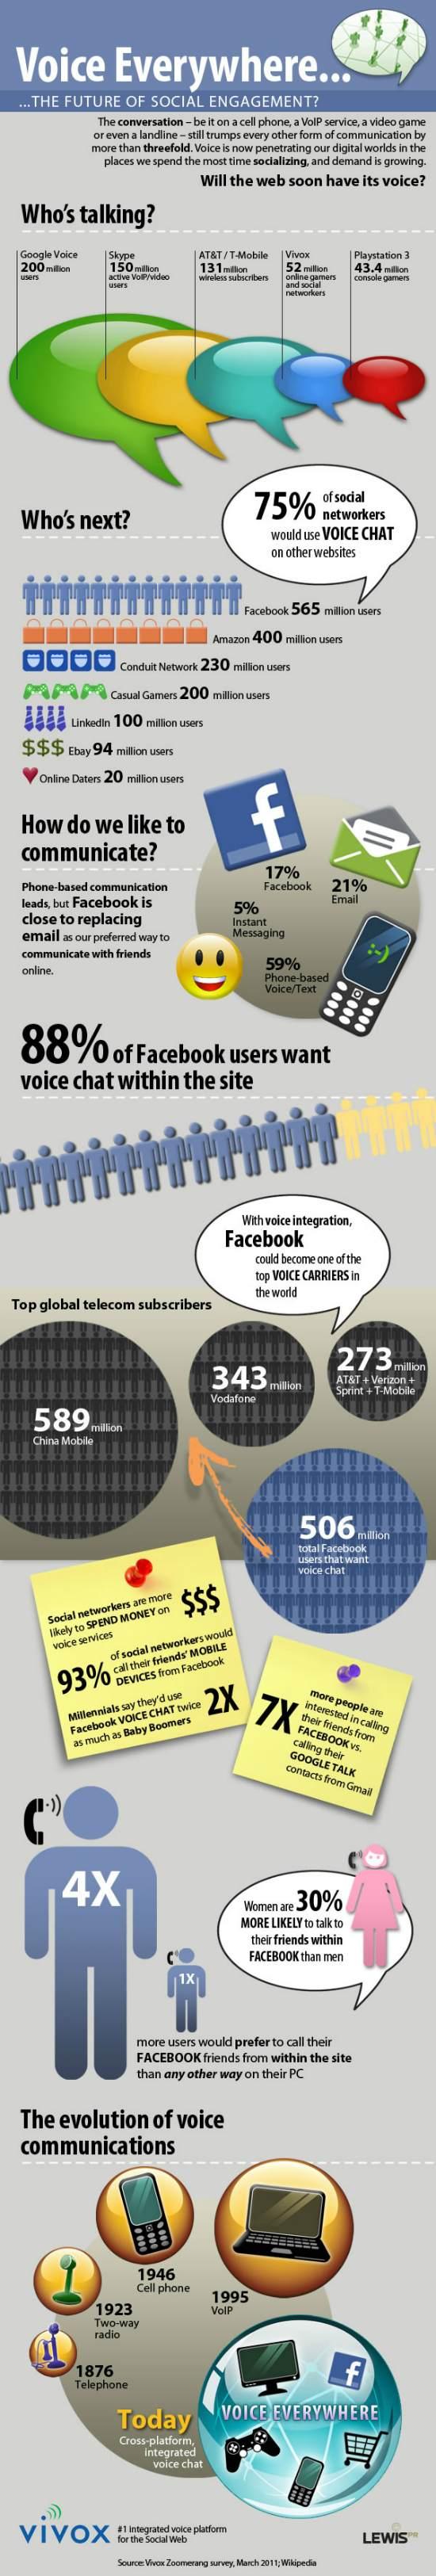 Infografico Facebook Chat por Voz